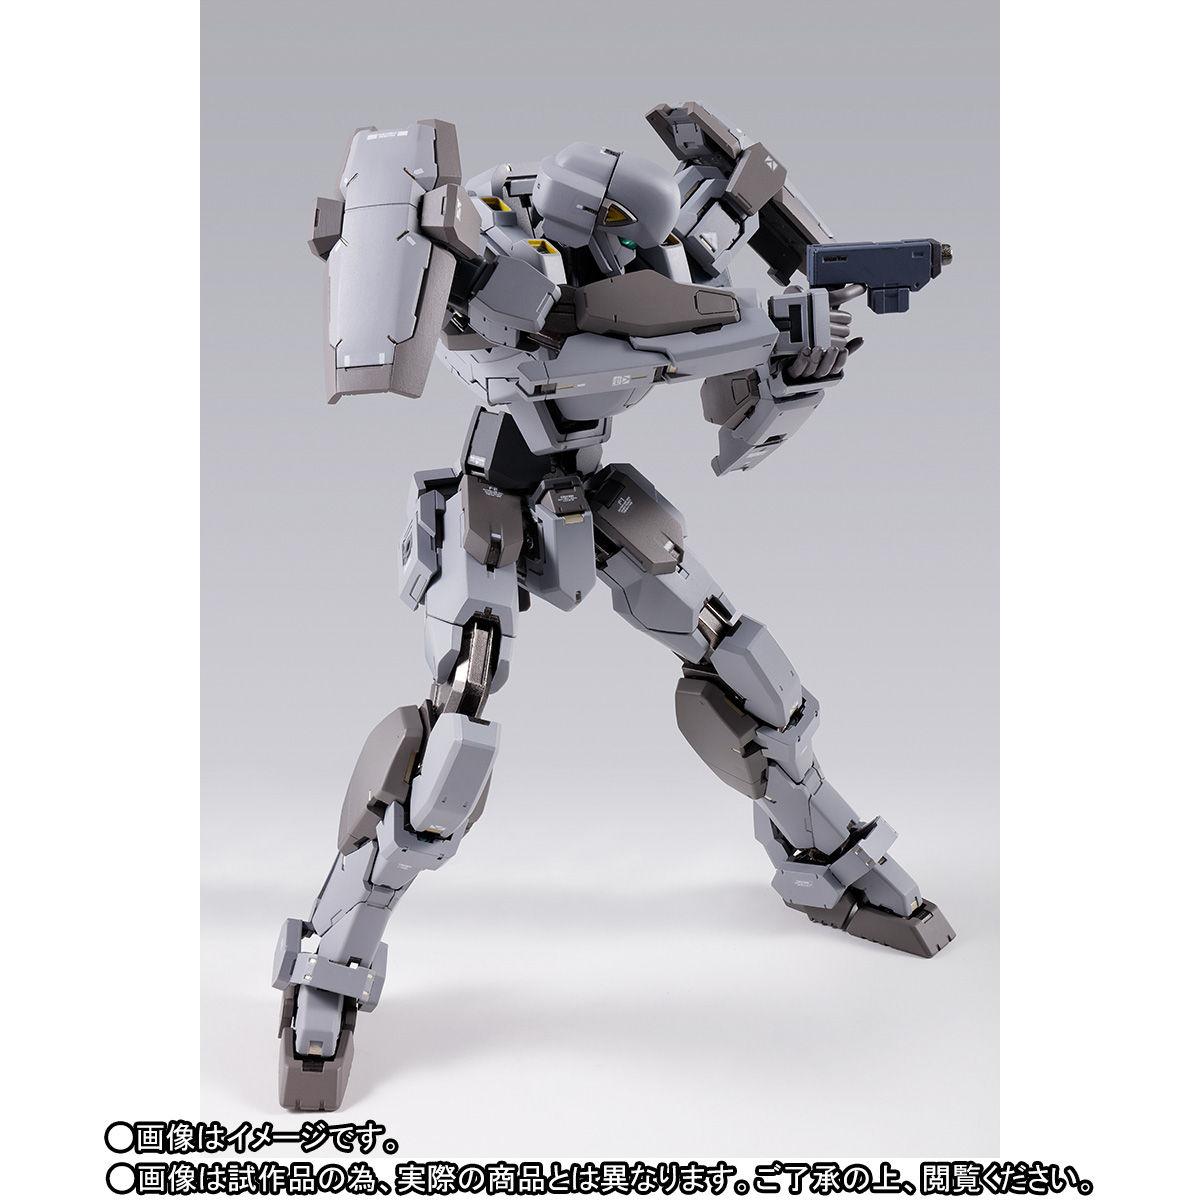 METAL BUILD『ガーンズバック Ver.IV|フルメタル・パニック!IV』可動フィギュア-009